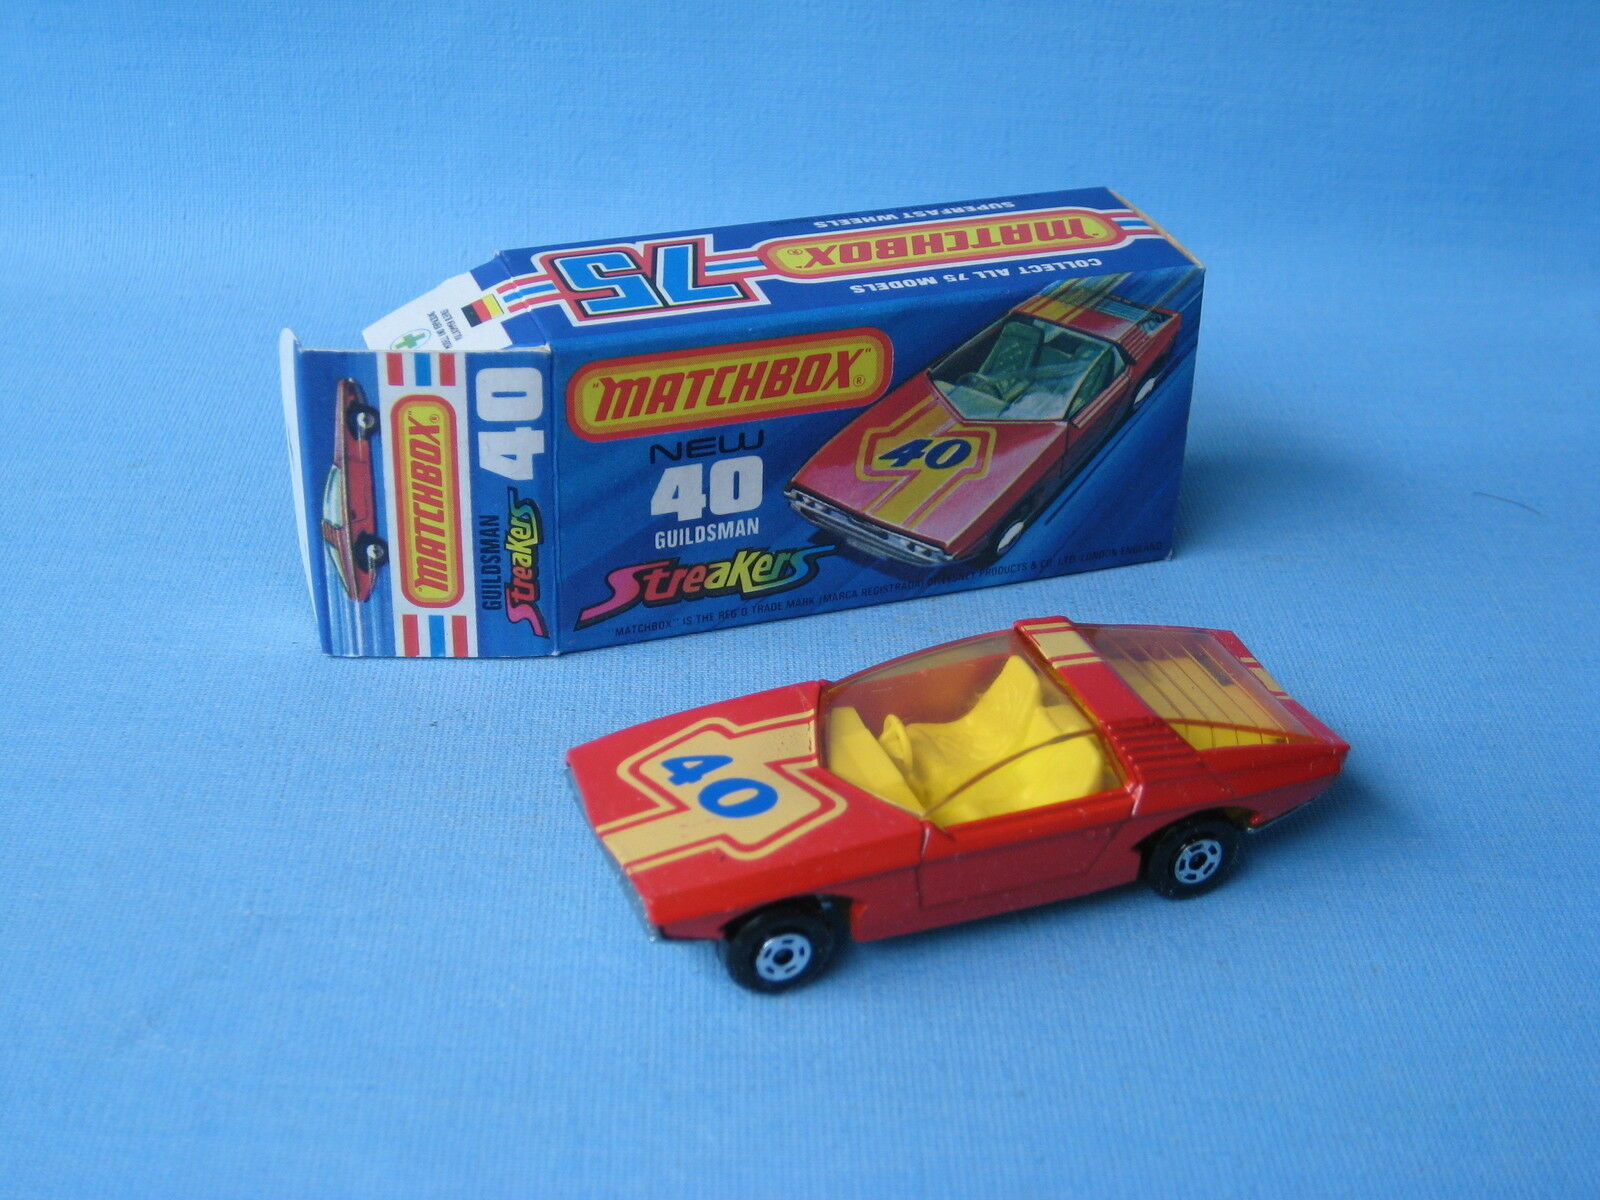 Lesney MATCHBOX SUPERFAST 40 Vauxhall Guildsman AMBRA finestra Streaker Streaker Streaker in Scatola 2ecb85